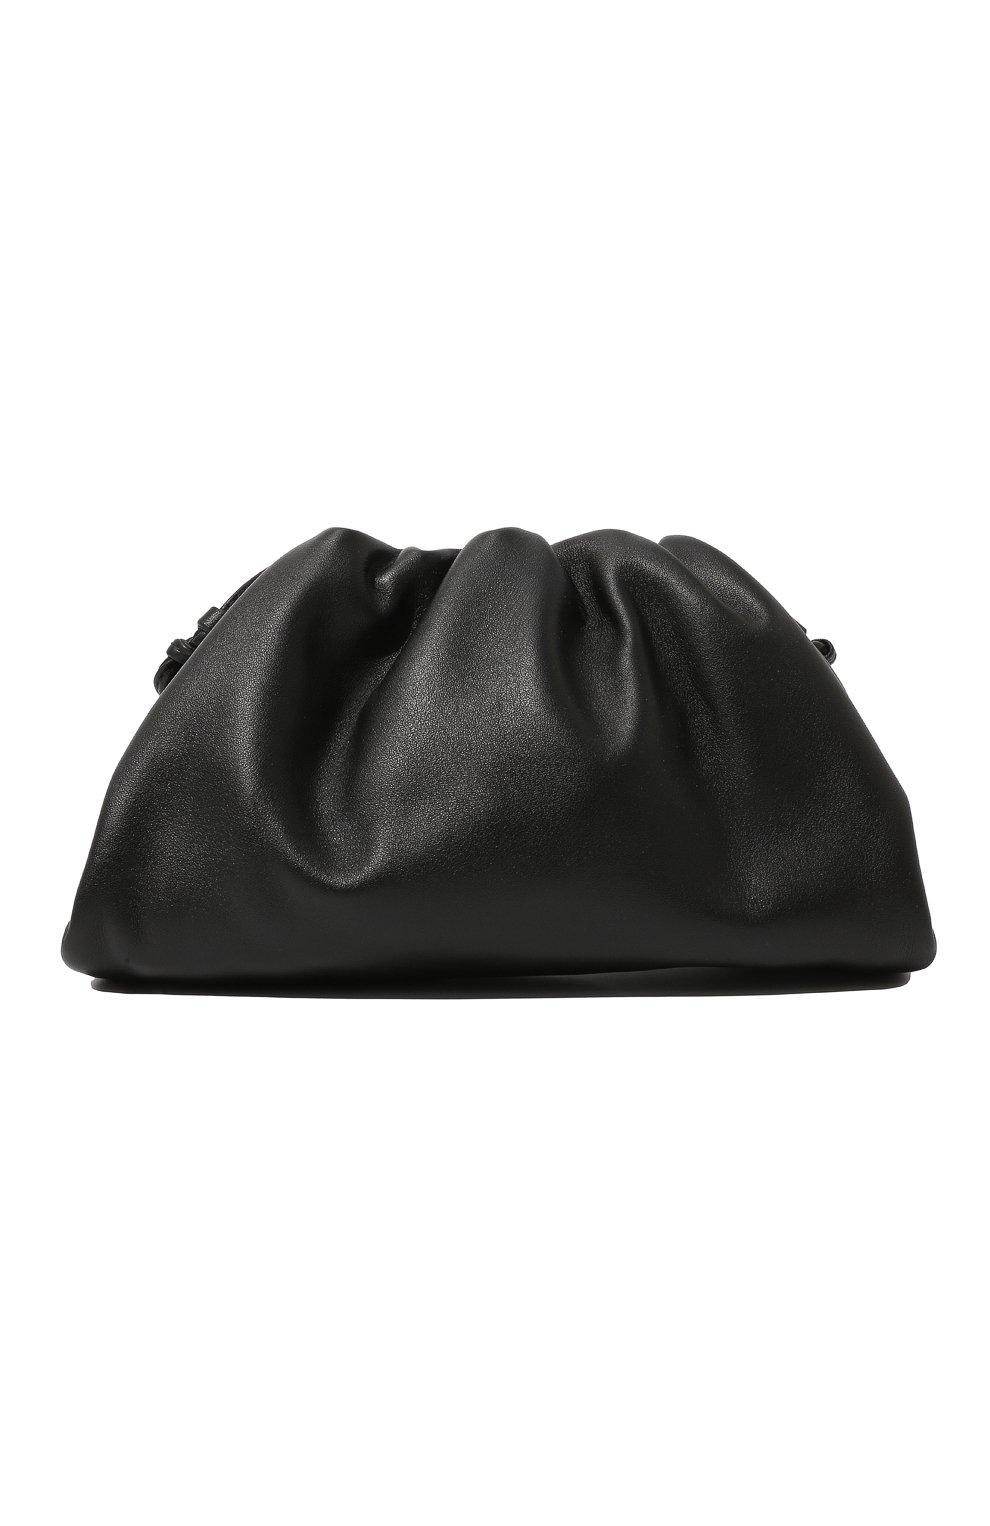 Женский клатч pouch 20 BOTTEGA VENETA черного цвета, арт. 585852/VCP40 | Фото 1